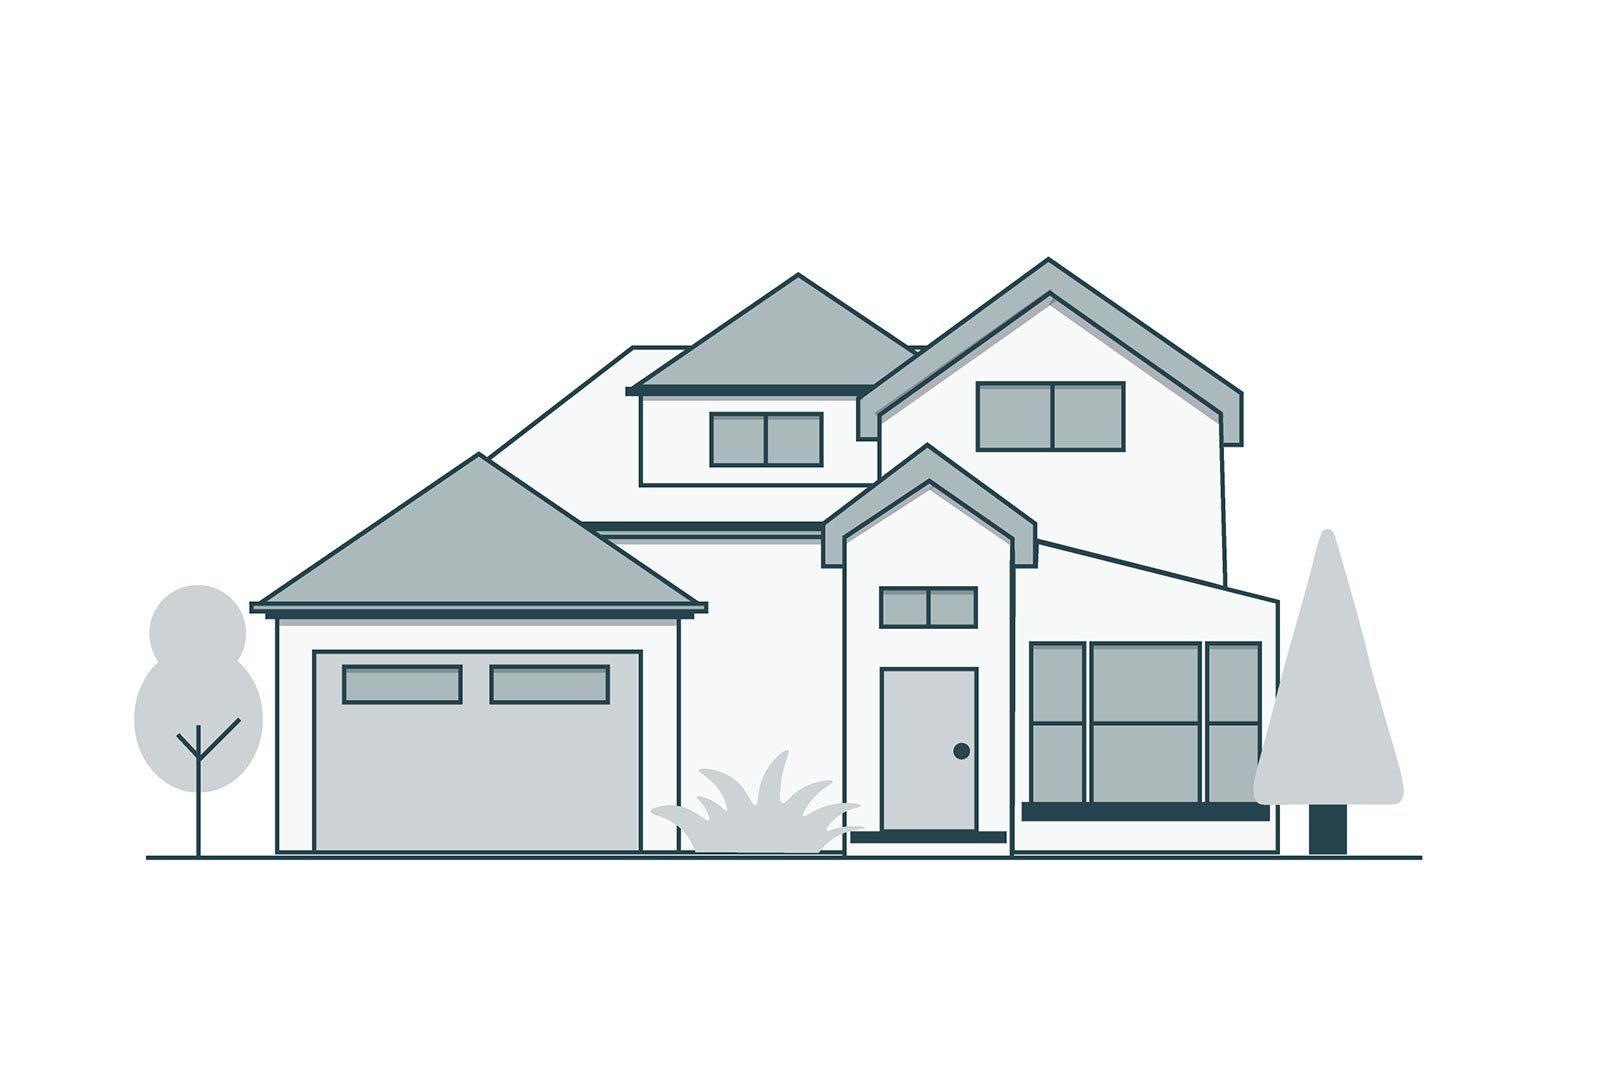 124 Panorama Dr San Francisco, CA 94131